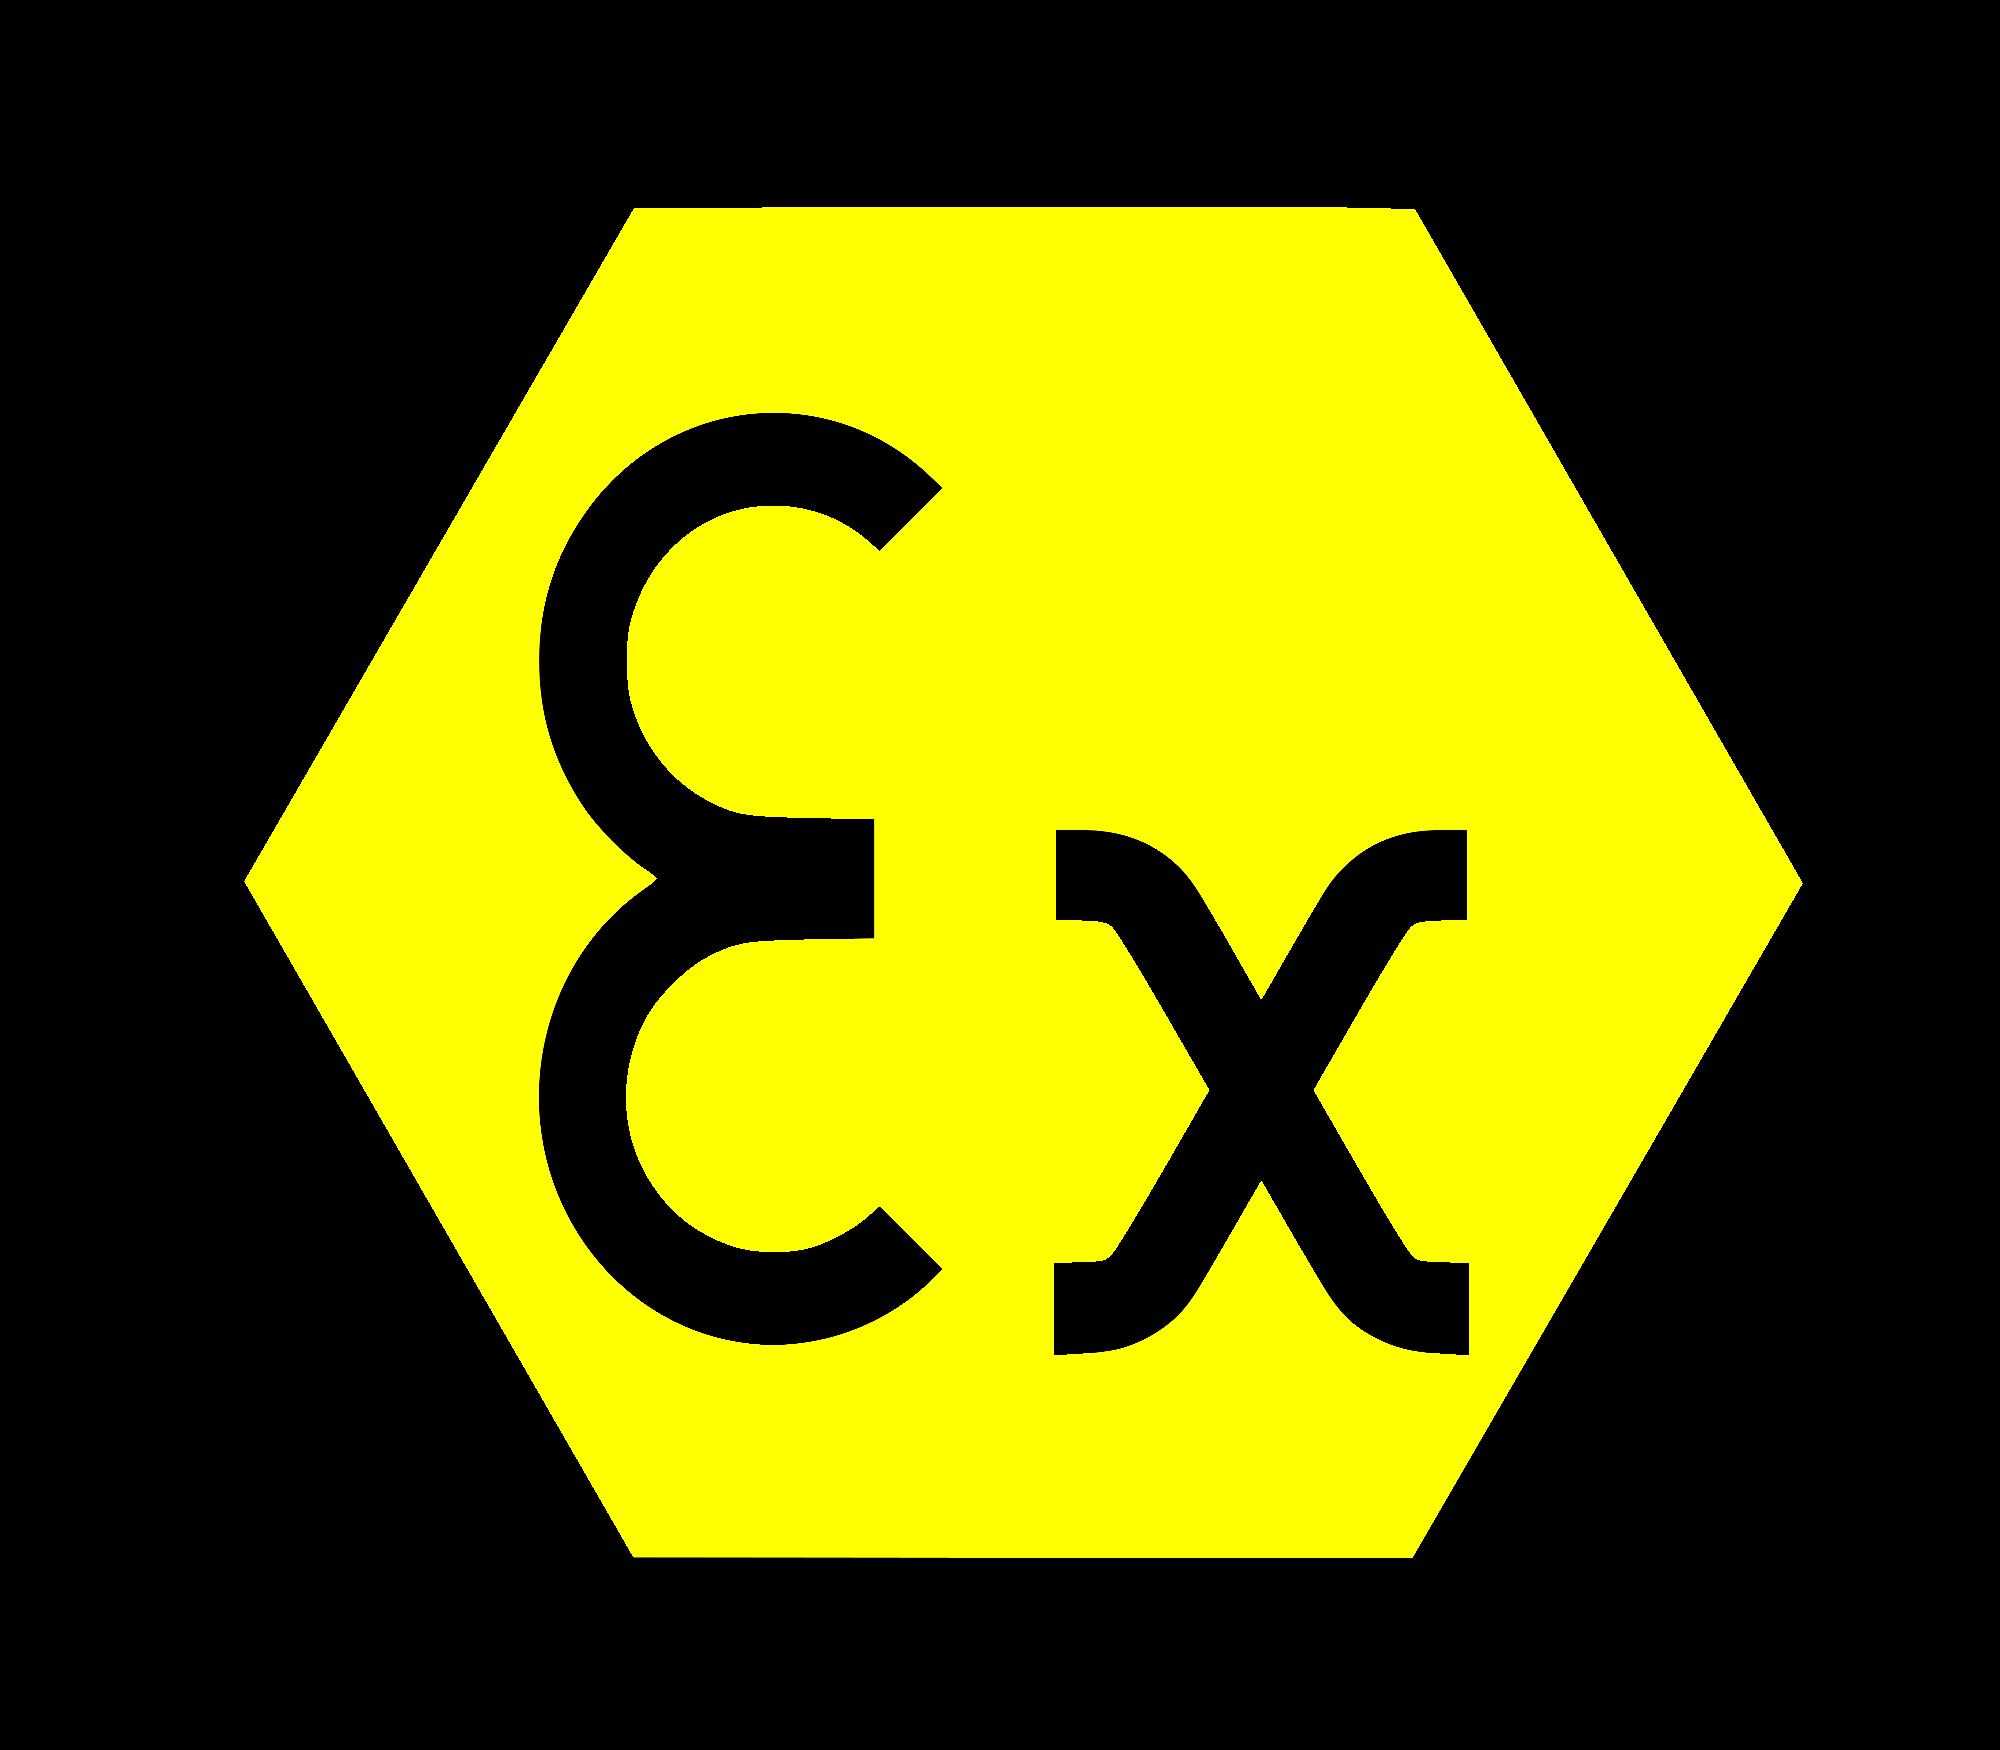 ATEX Certification logo